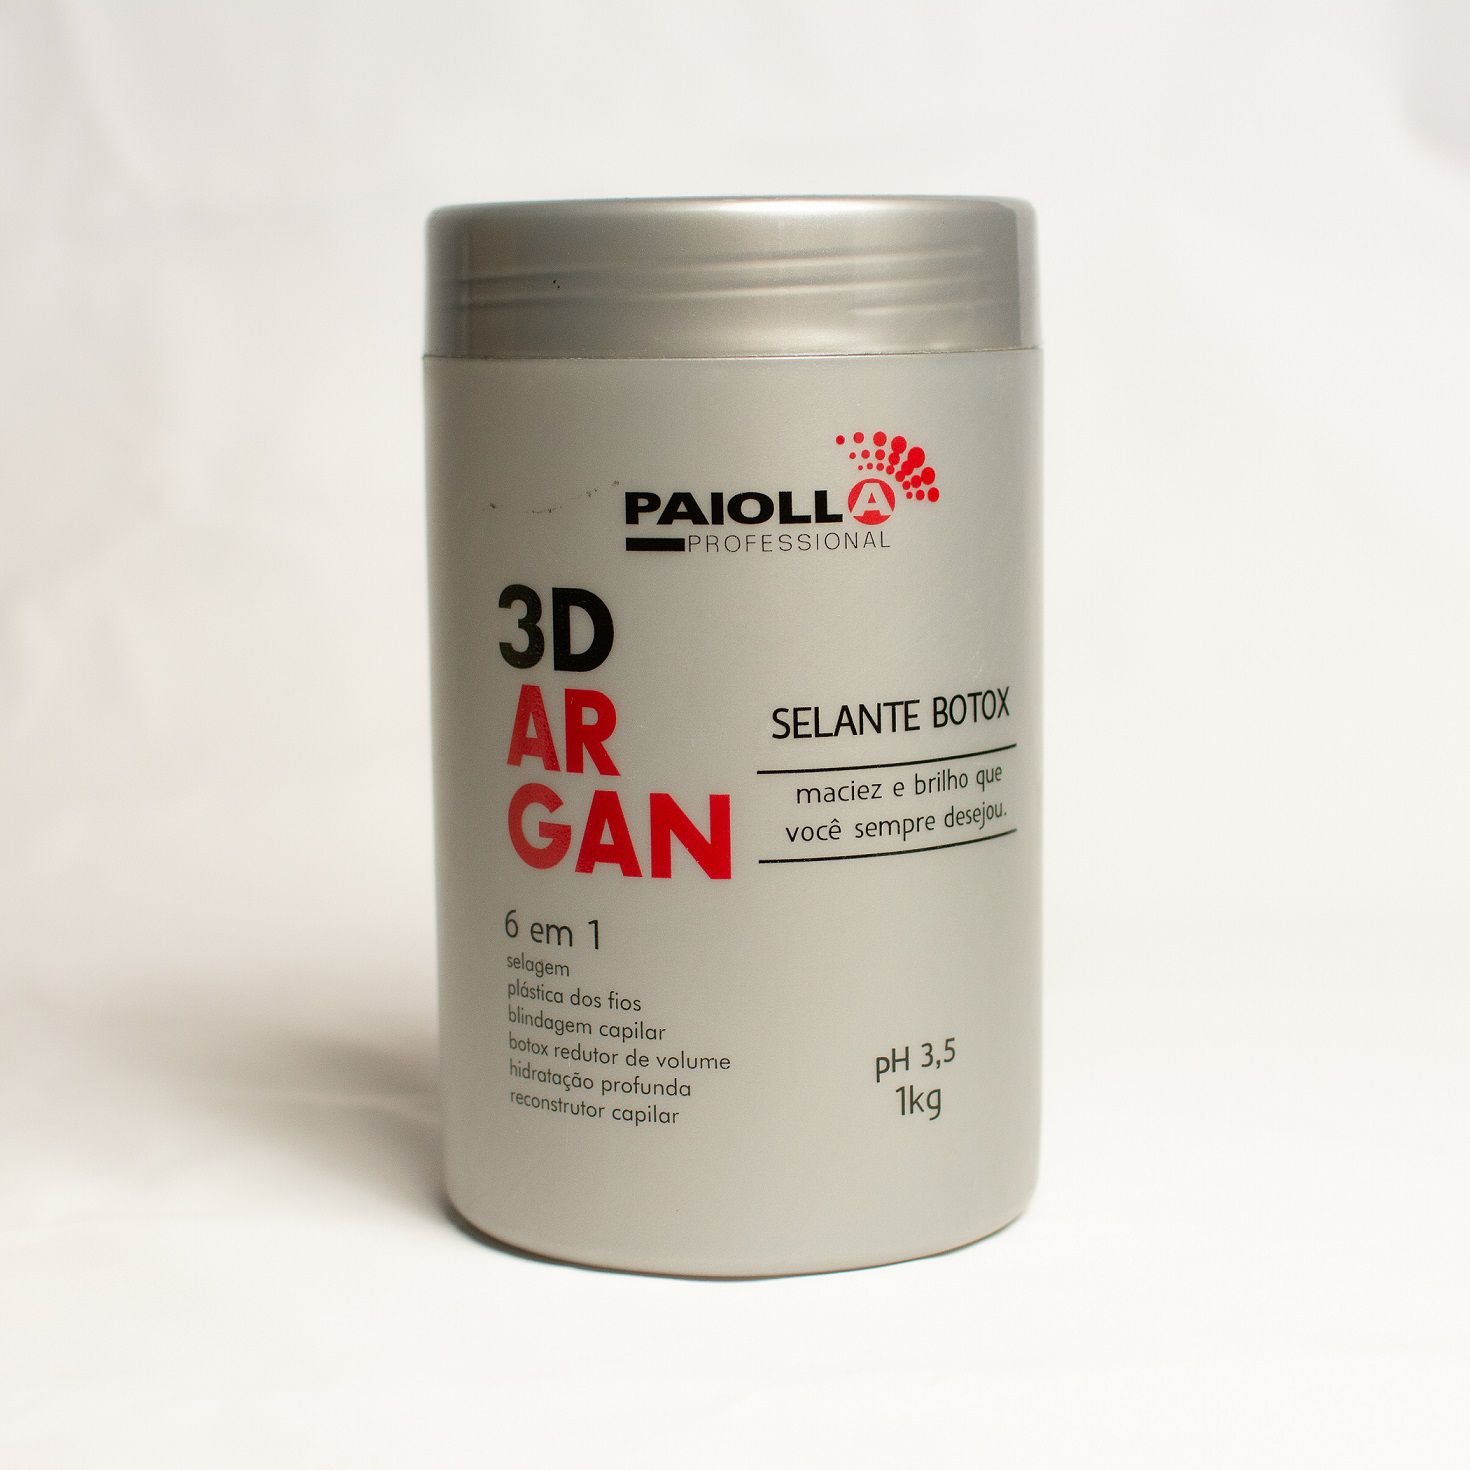 COMBO Escova Progressiva Sem Formol Bambu + Selante Botox 3D Argan